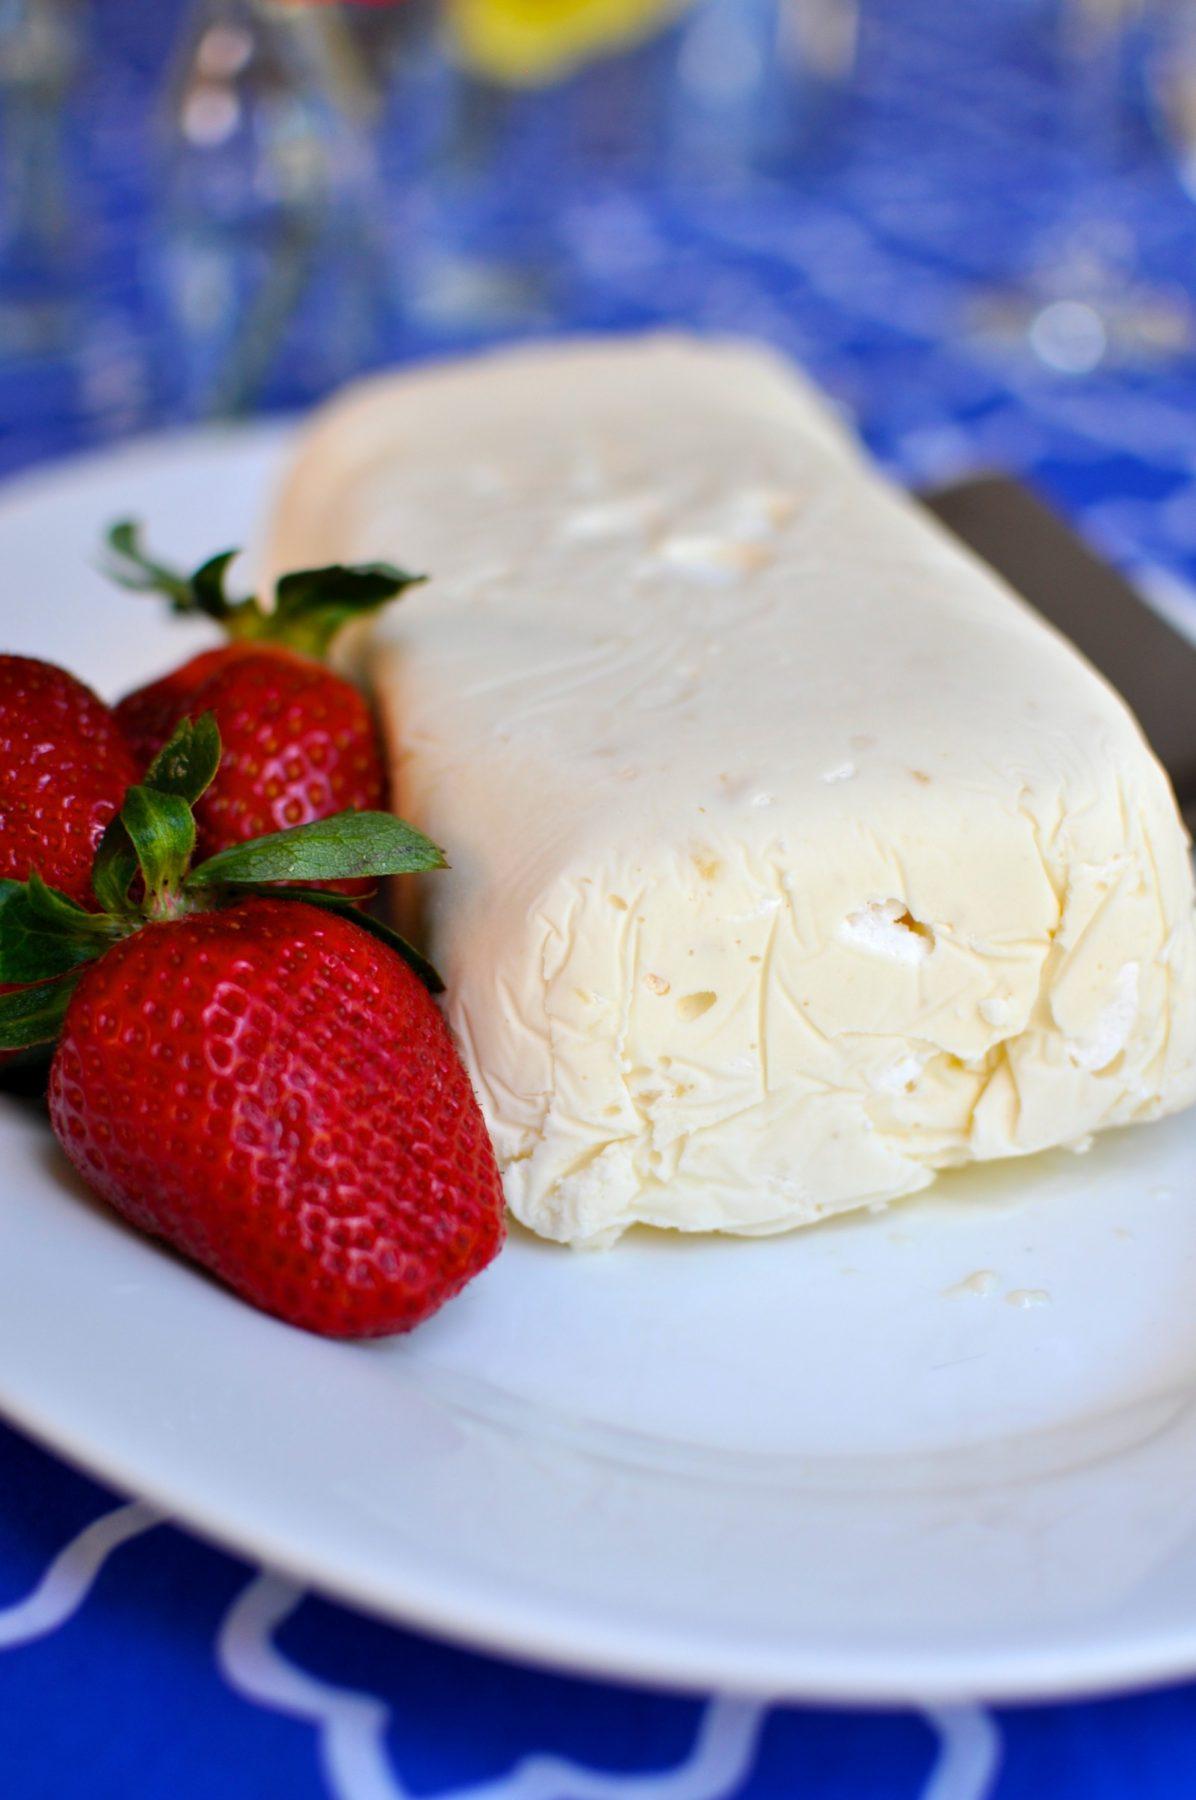 Lemon meringue ice cream with chocolate sauce